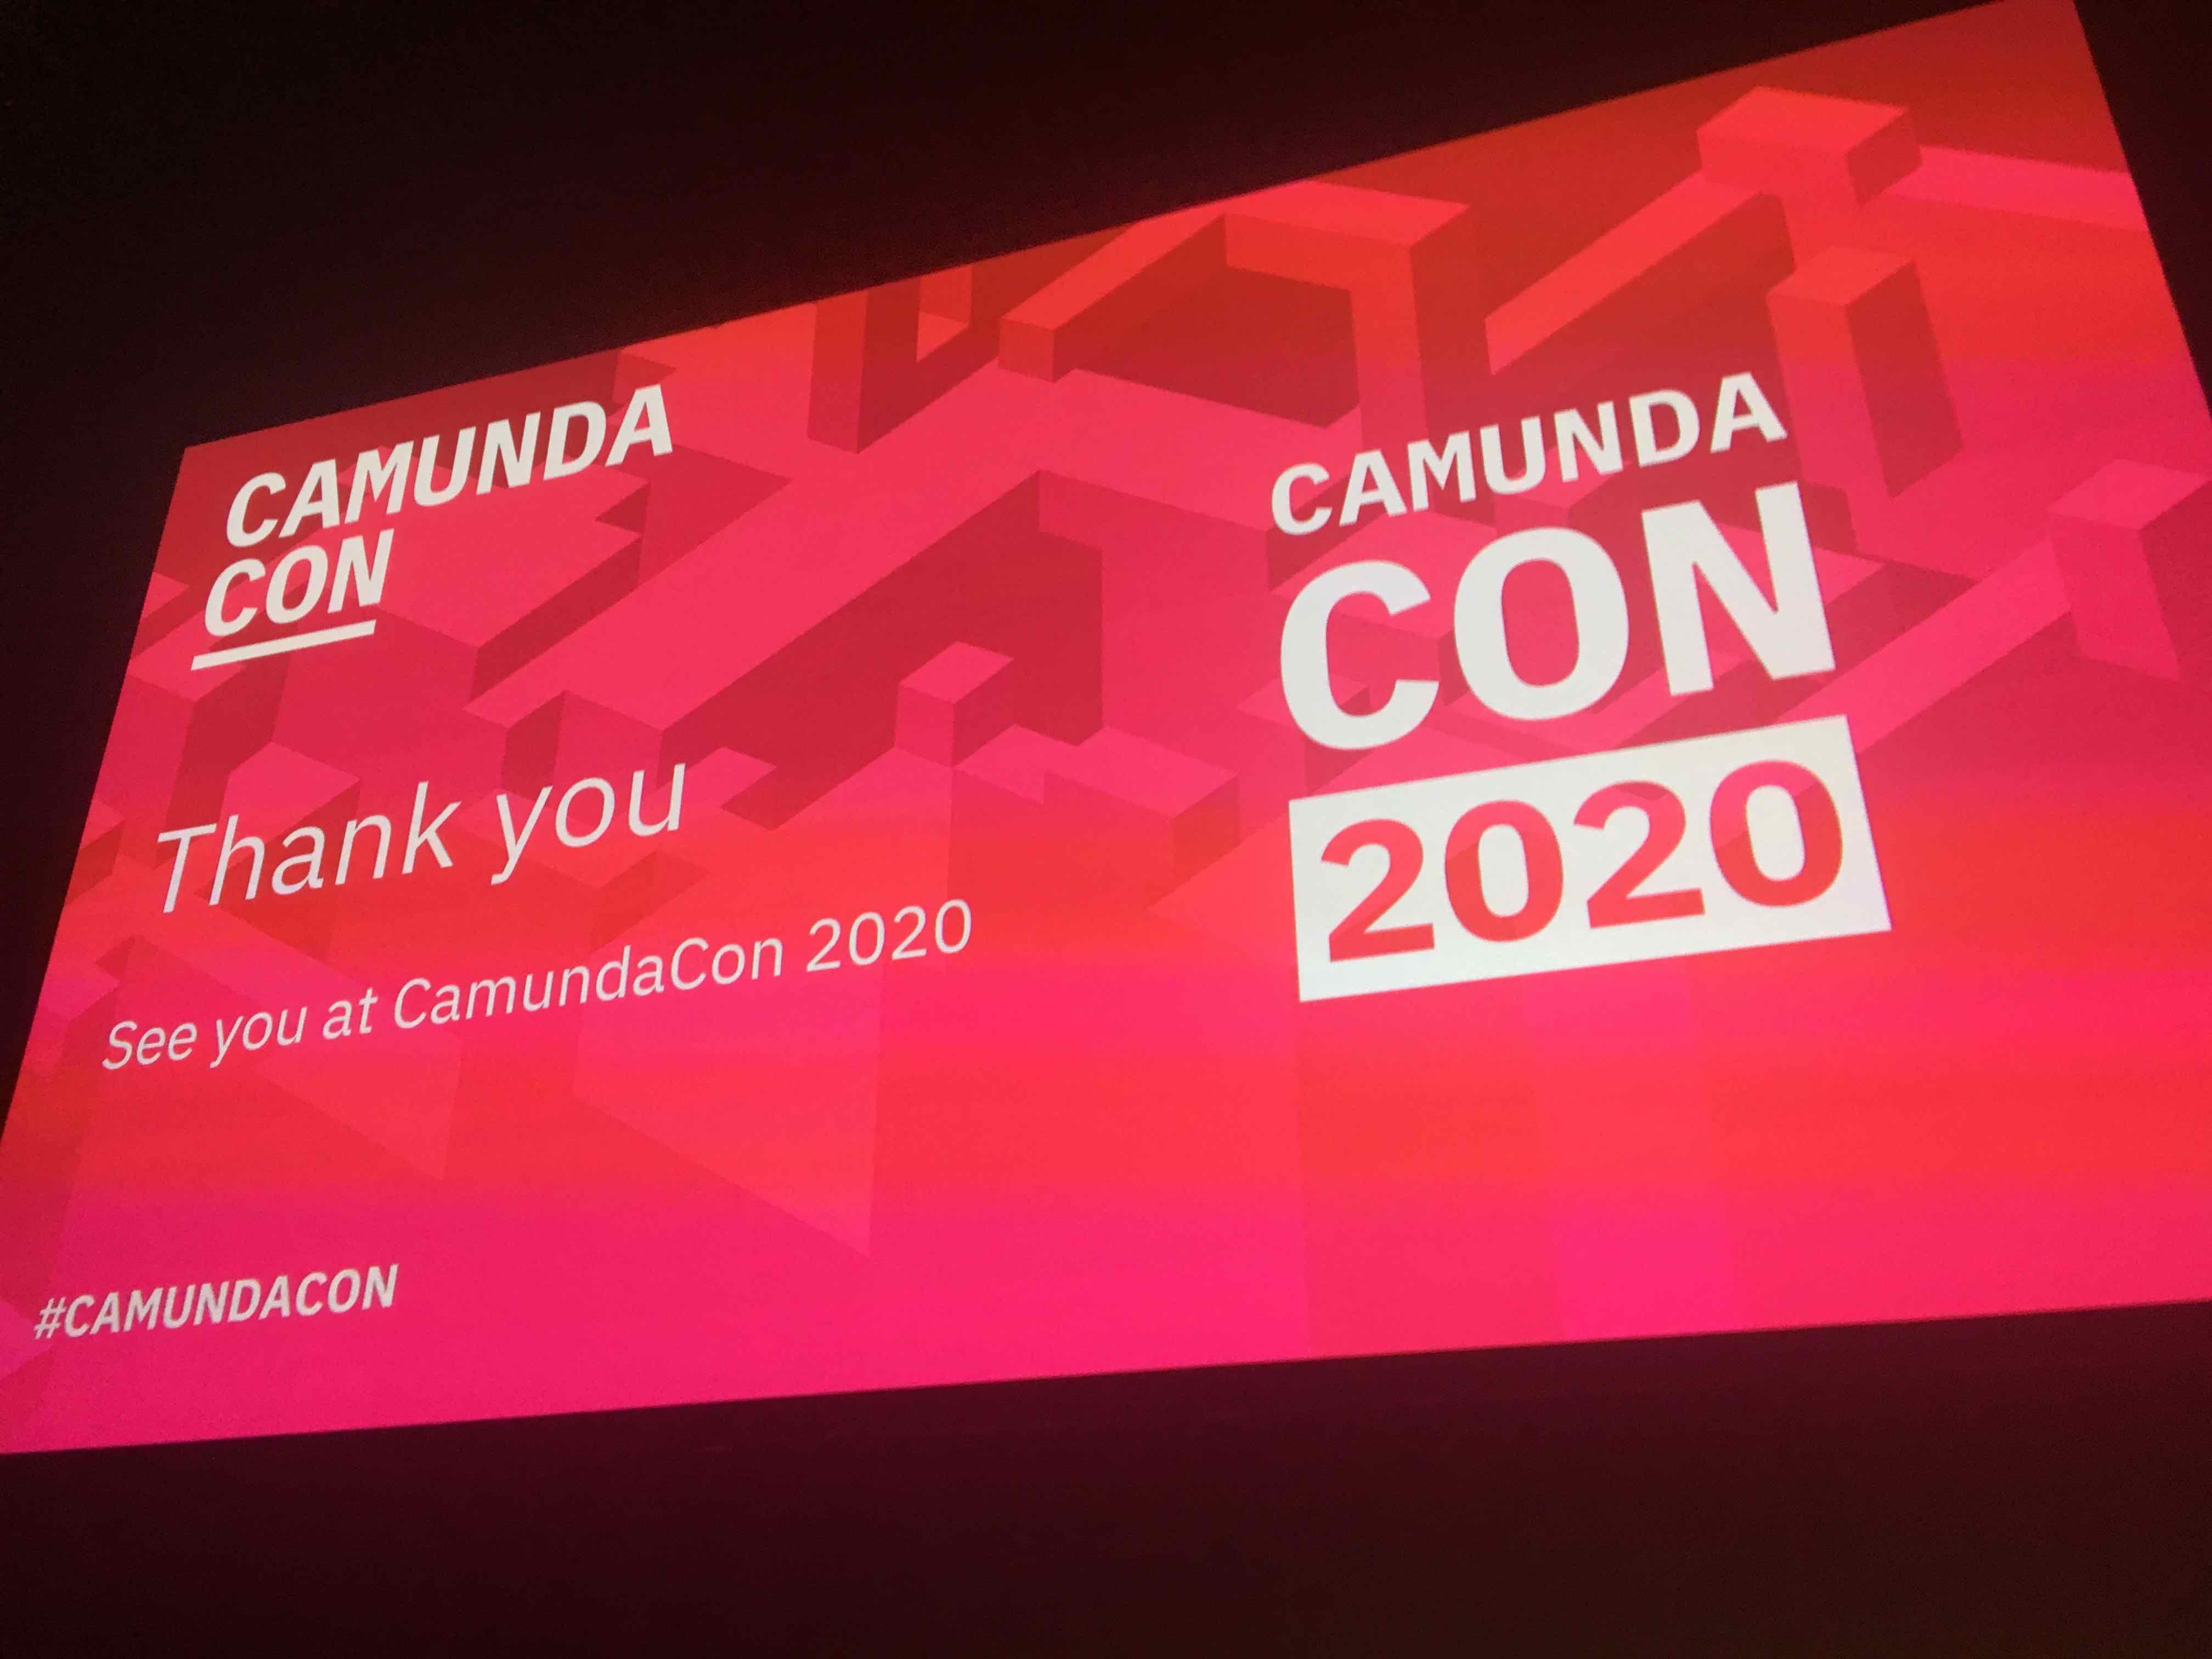 CamundaCon